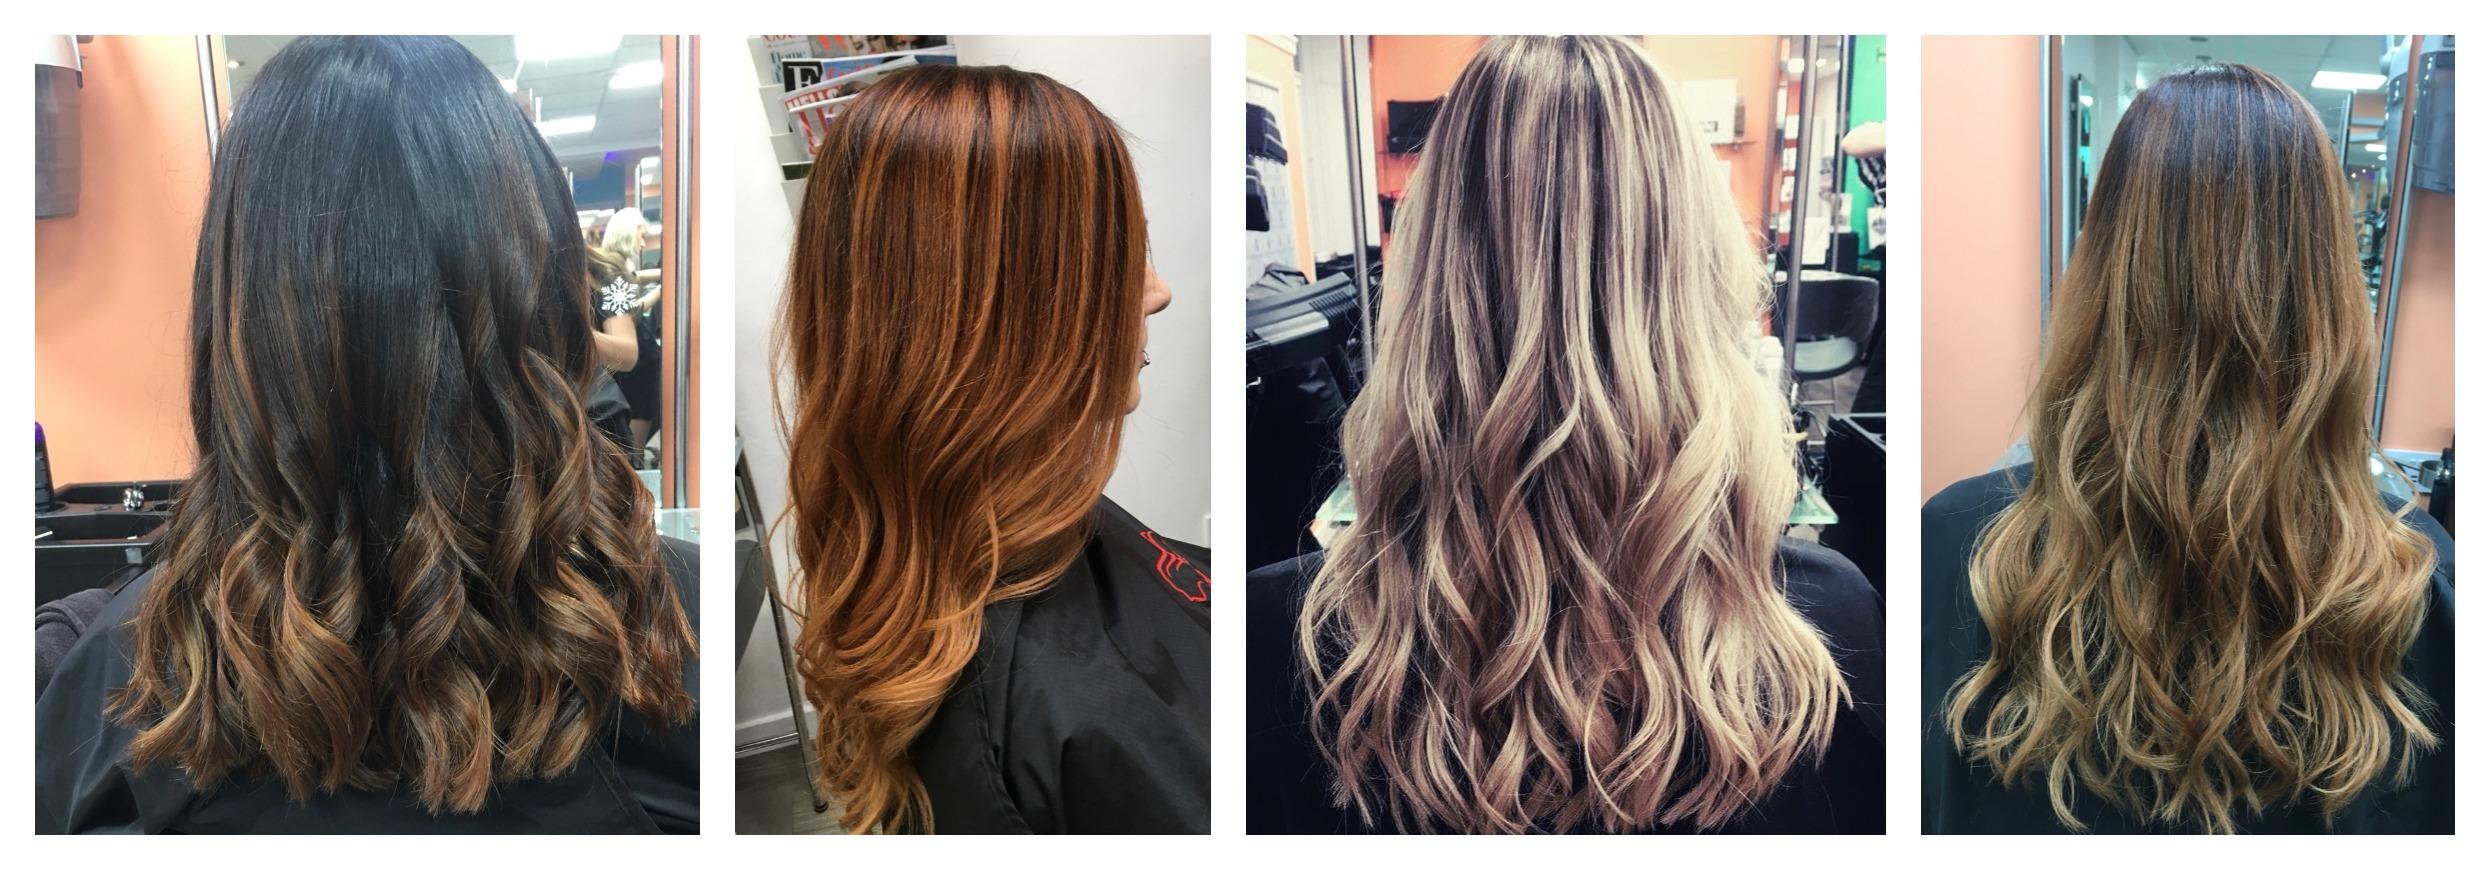 balayage hair colour salon Dundee